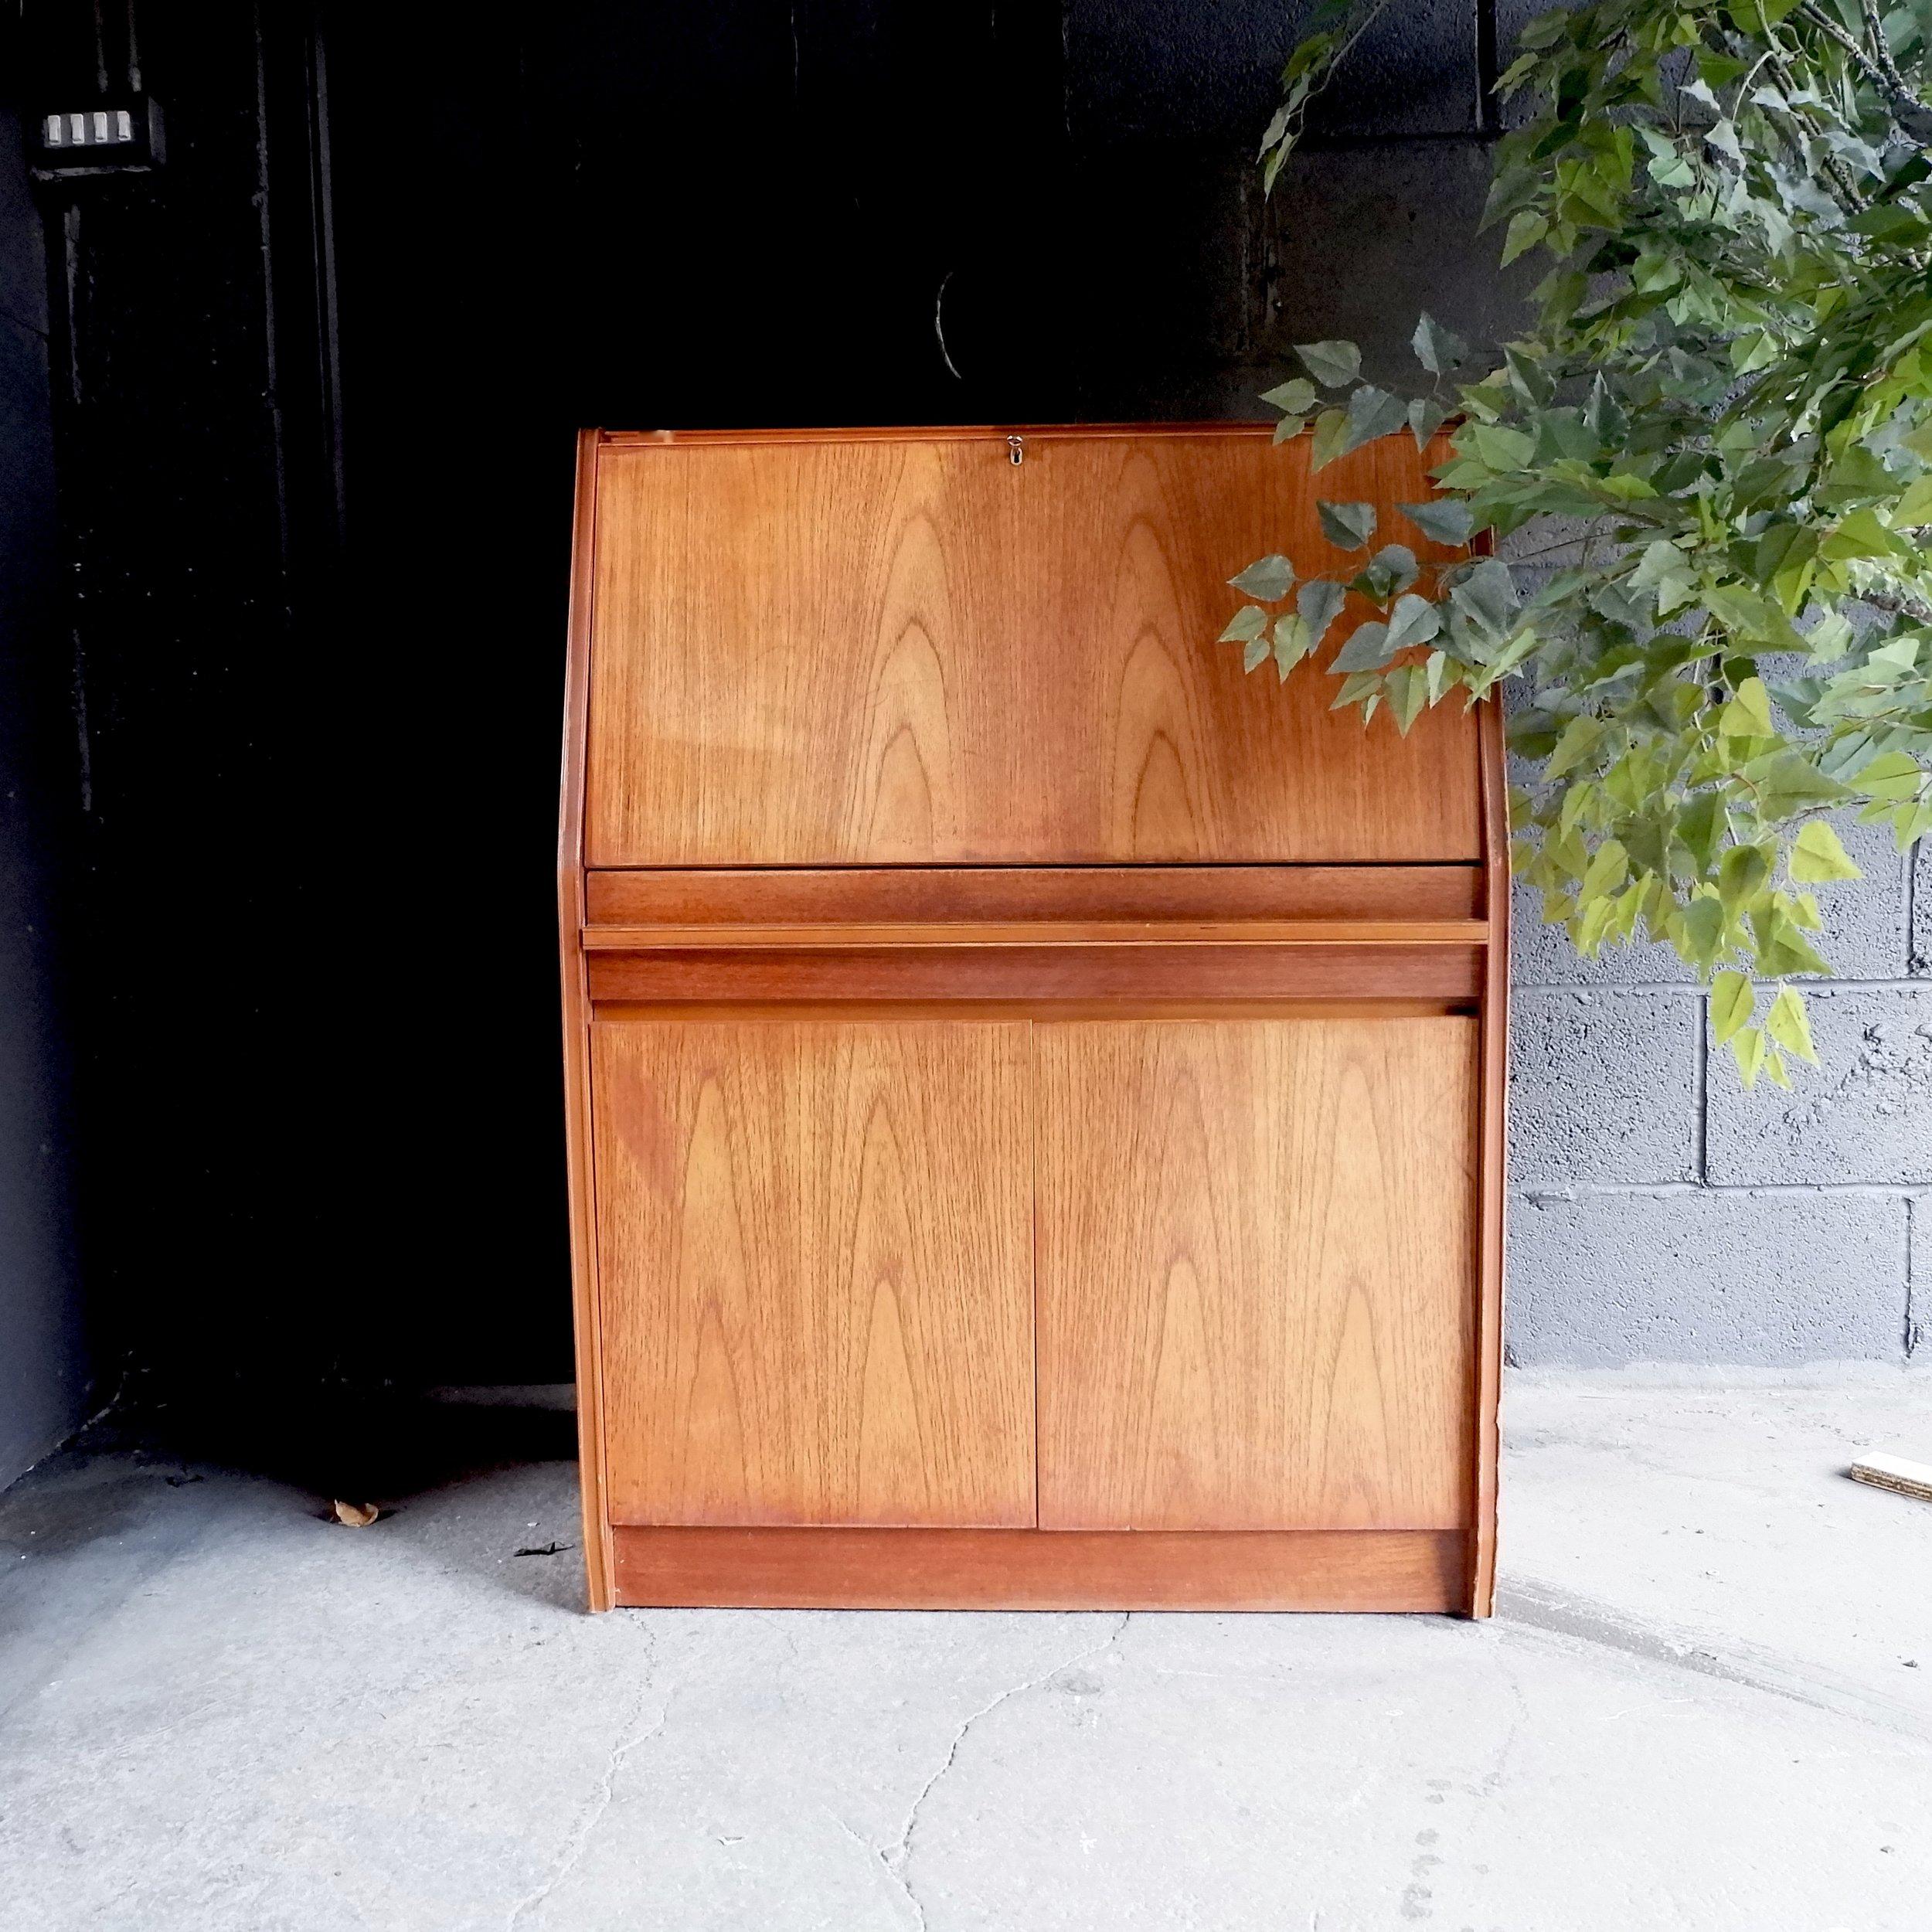 Bureau Retro Design.Retro Vintage Mid Century Bureau Storage Desk Unit Almeida Interior